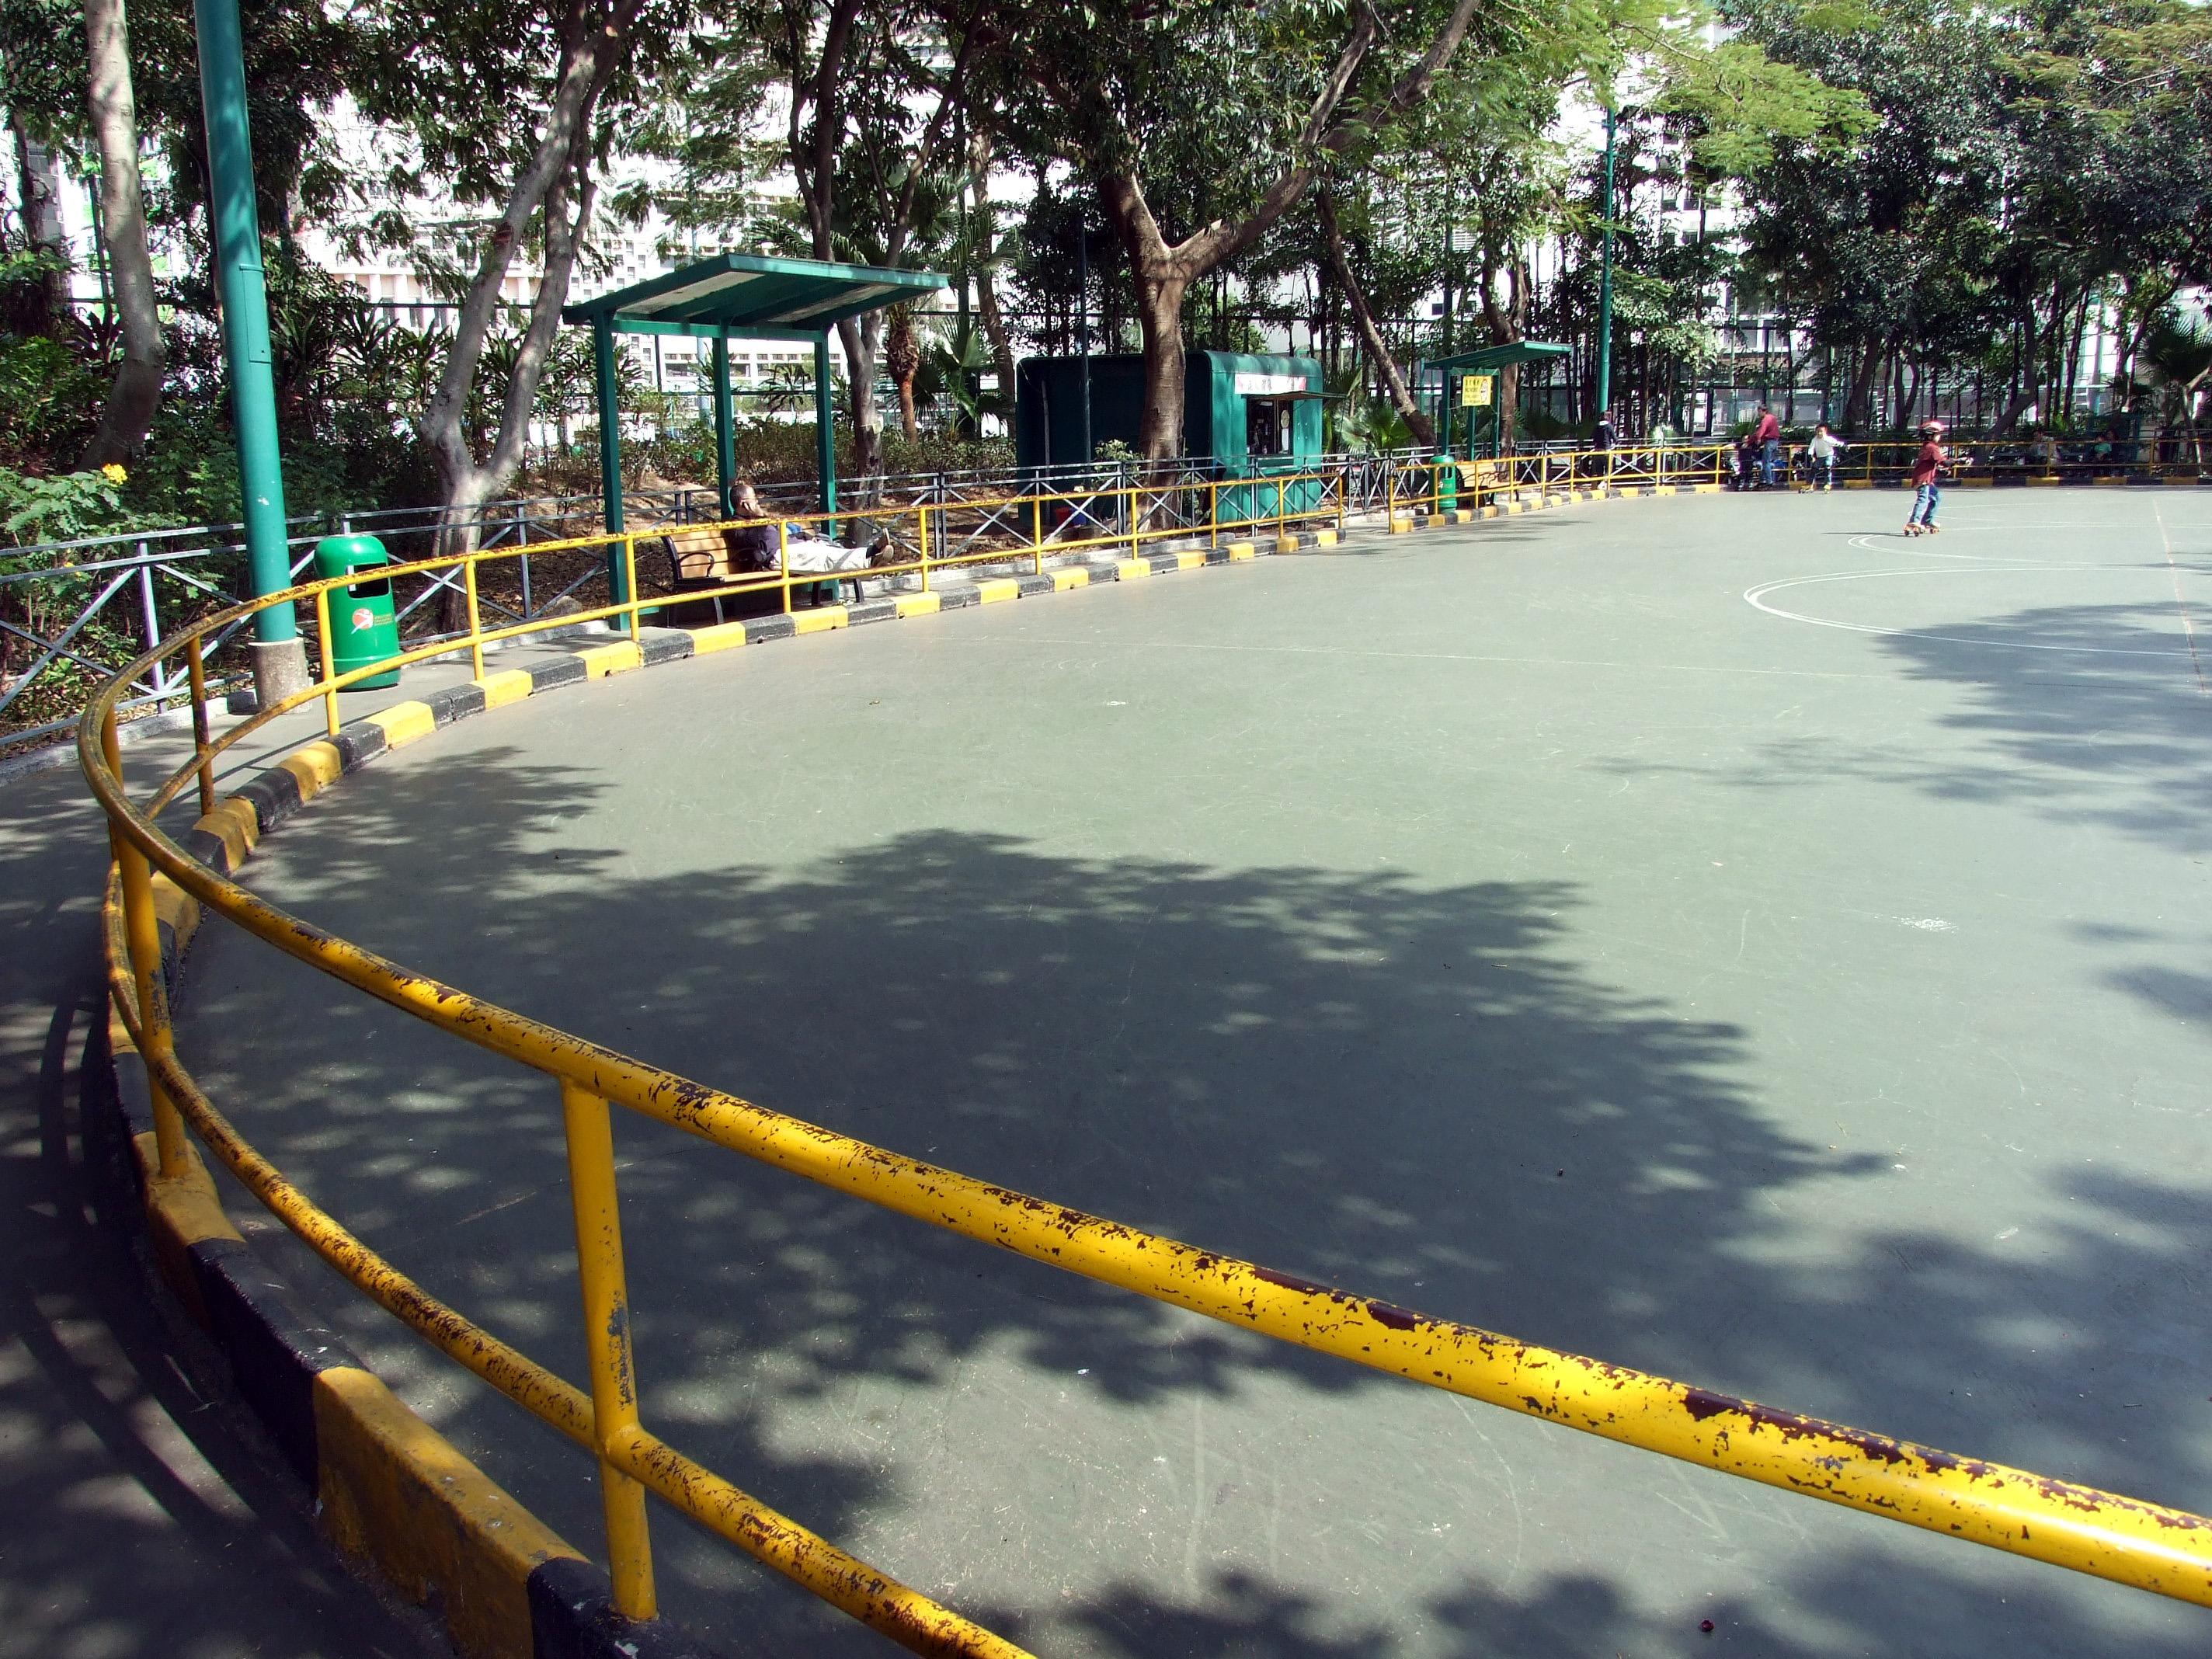 Roller skating venues - File Hk Victoriapark Rollerskatingrink Jpg